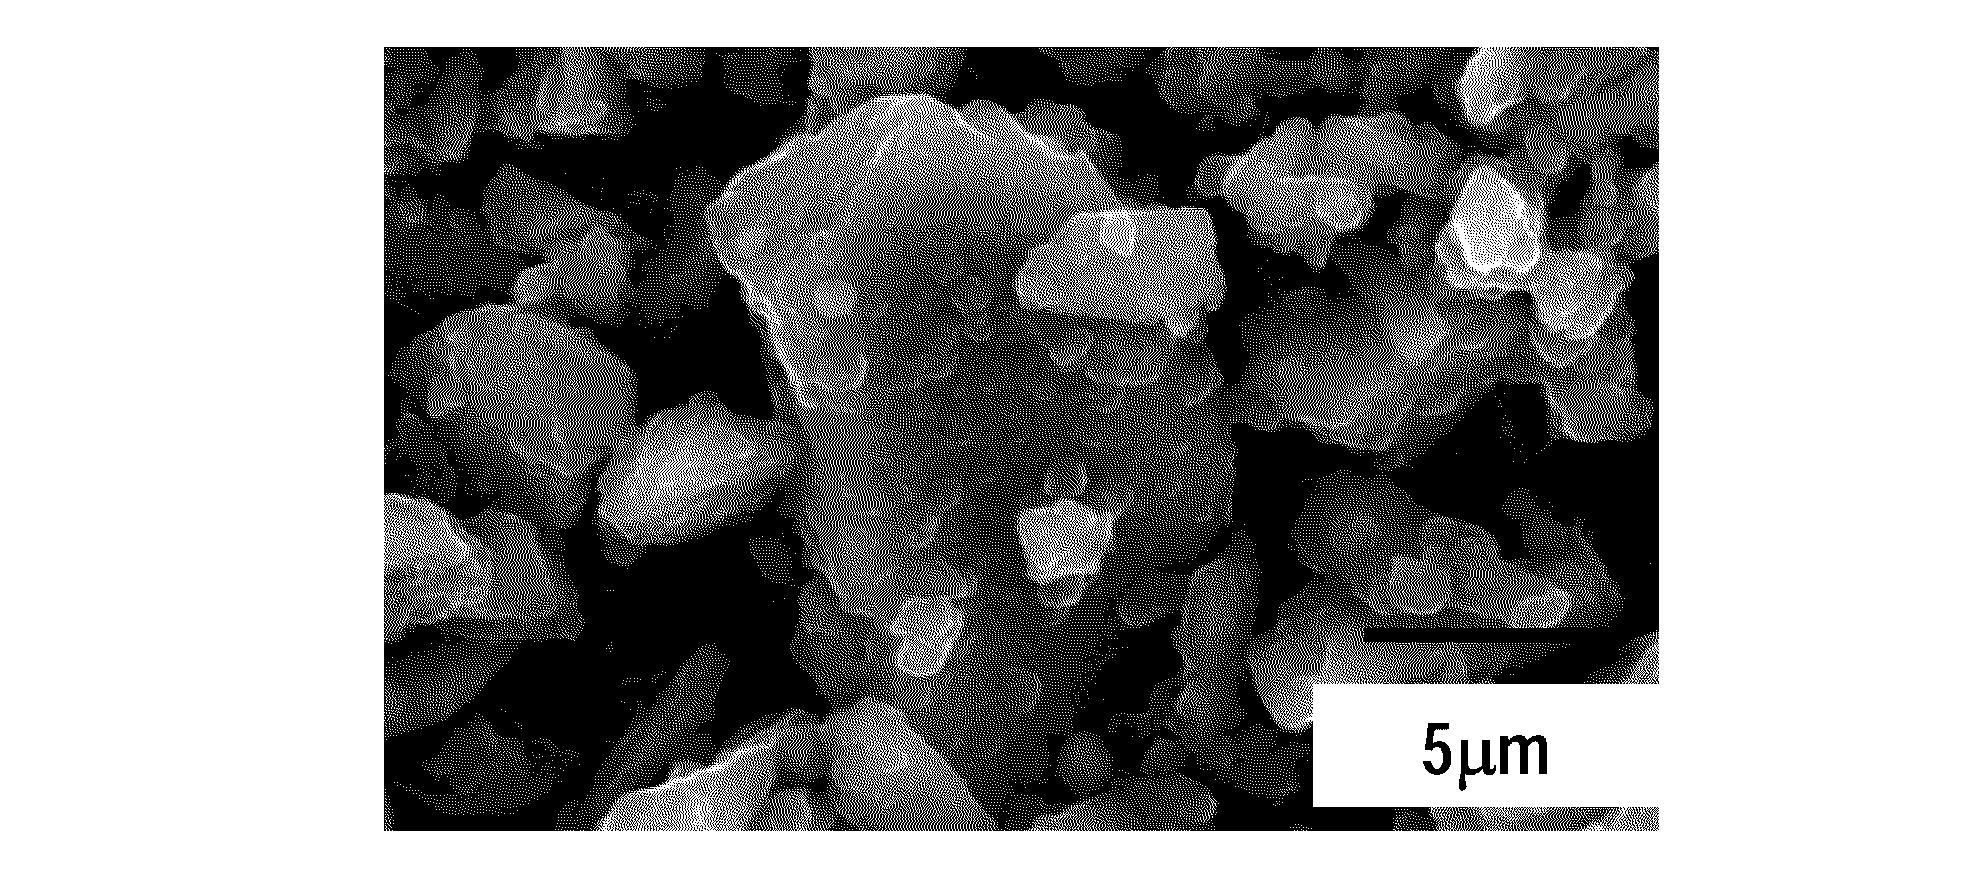 WO2012144177A1 - リチウムイオン二次電池用負極及びその負極を用いたリチウムイオン二次電池         - Google PatentsFamily